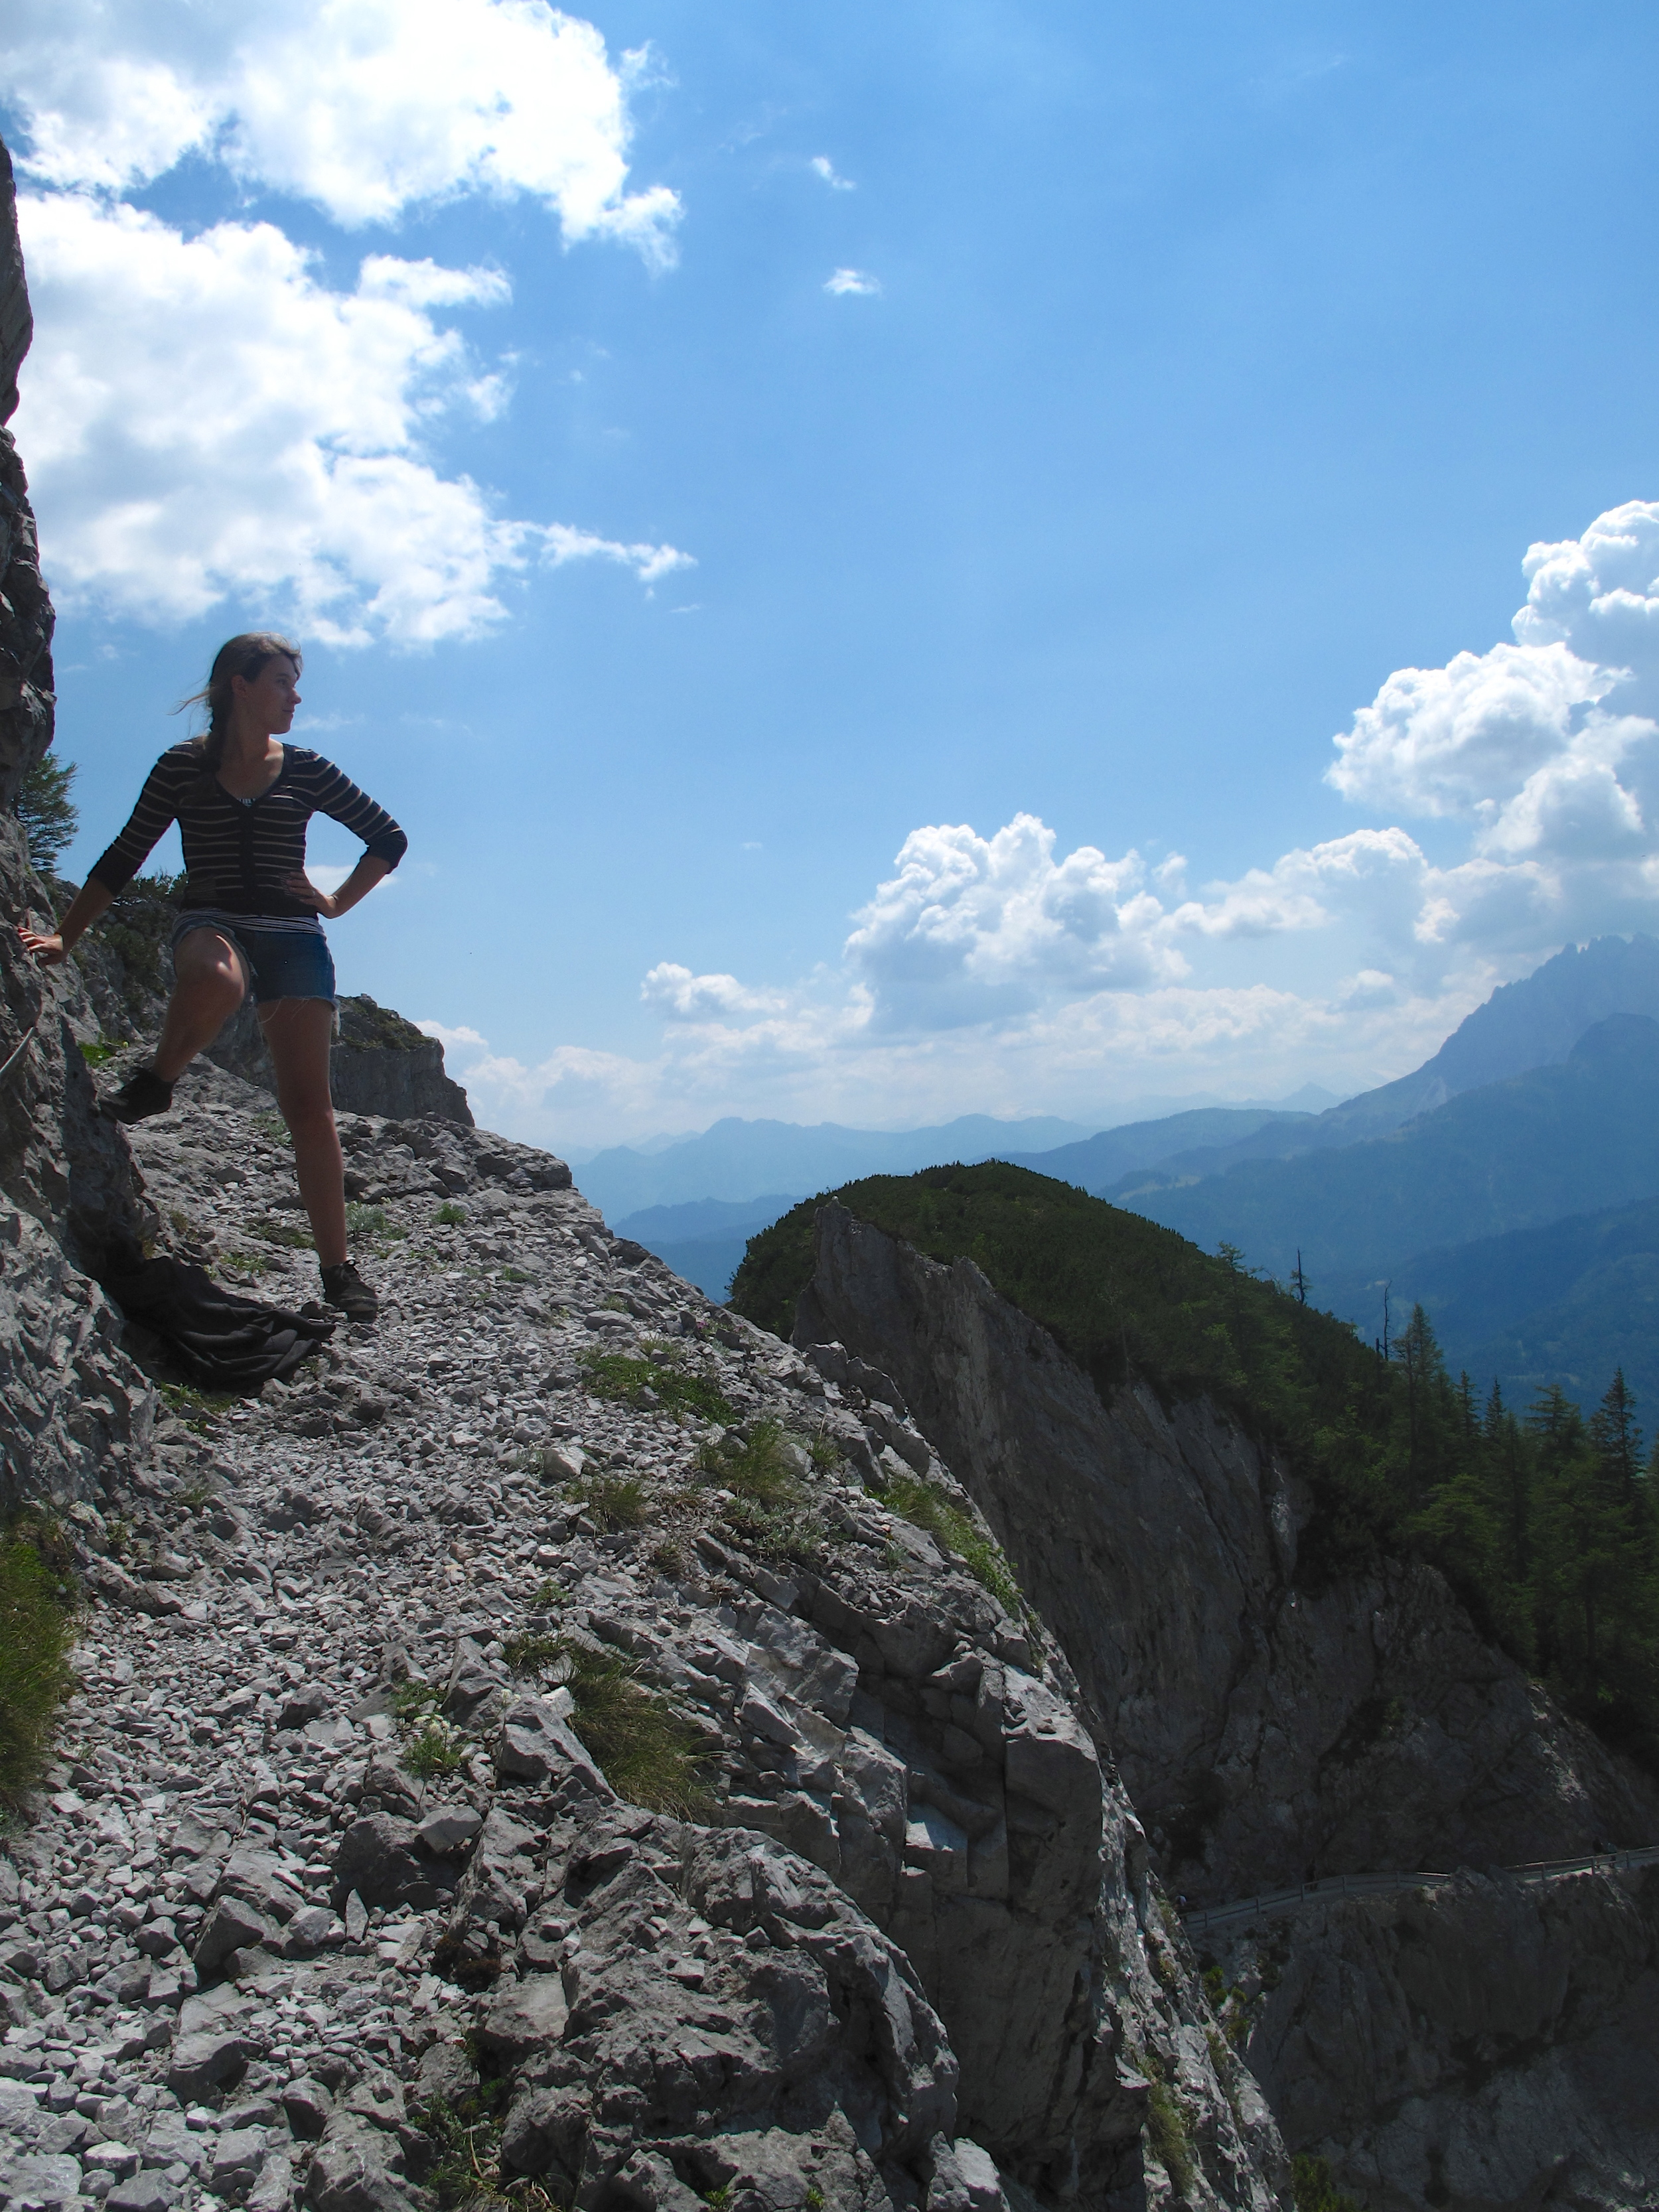 Climbing a mountain trail near Werfen, Austria- being intrepid.